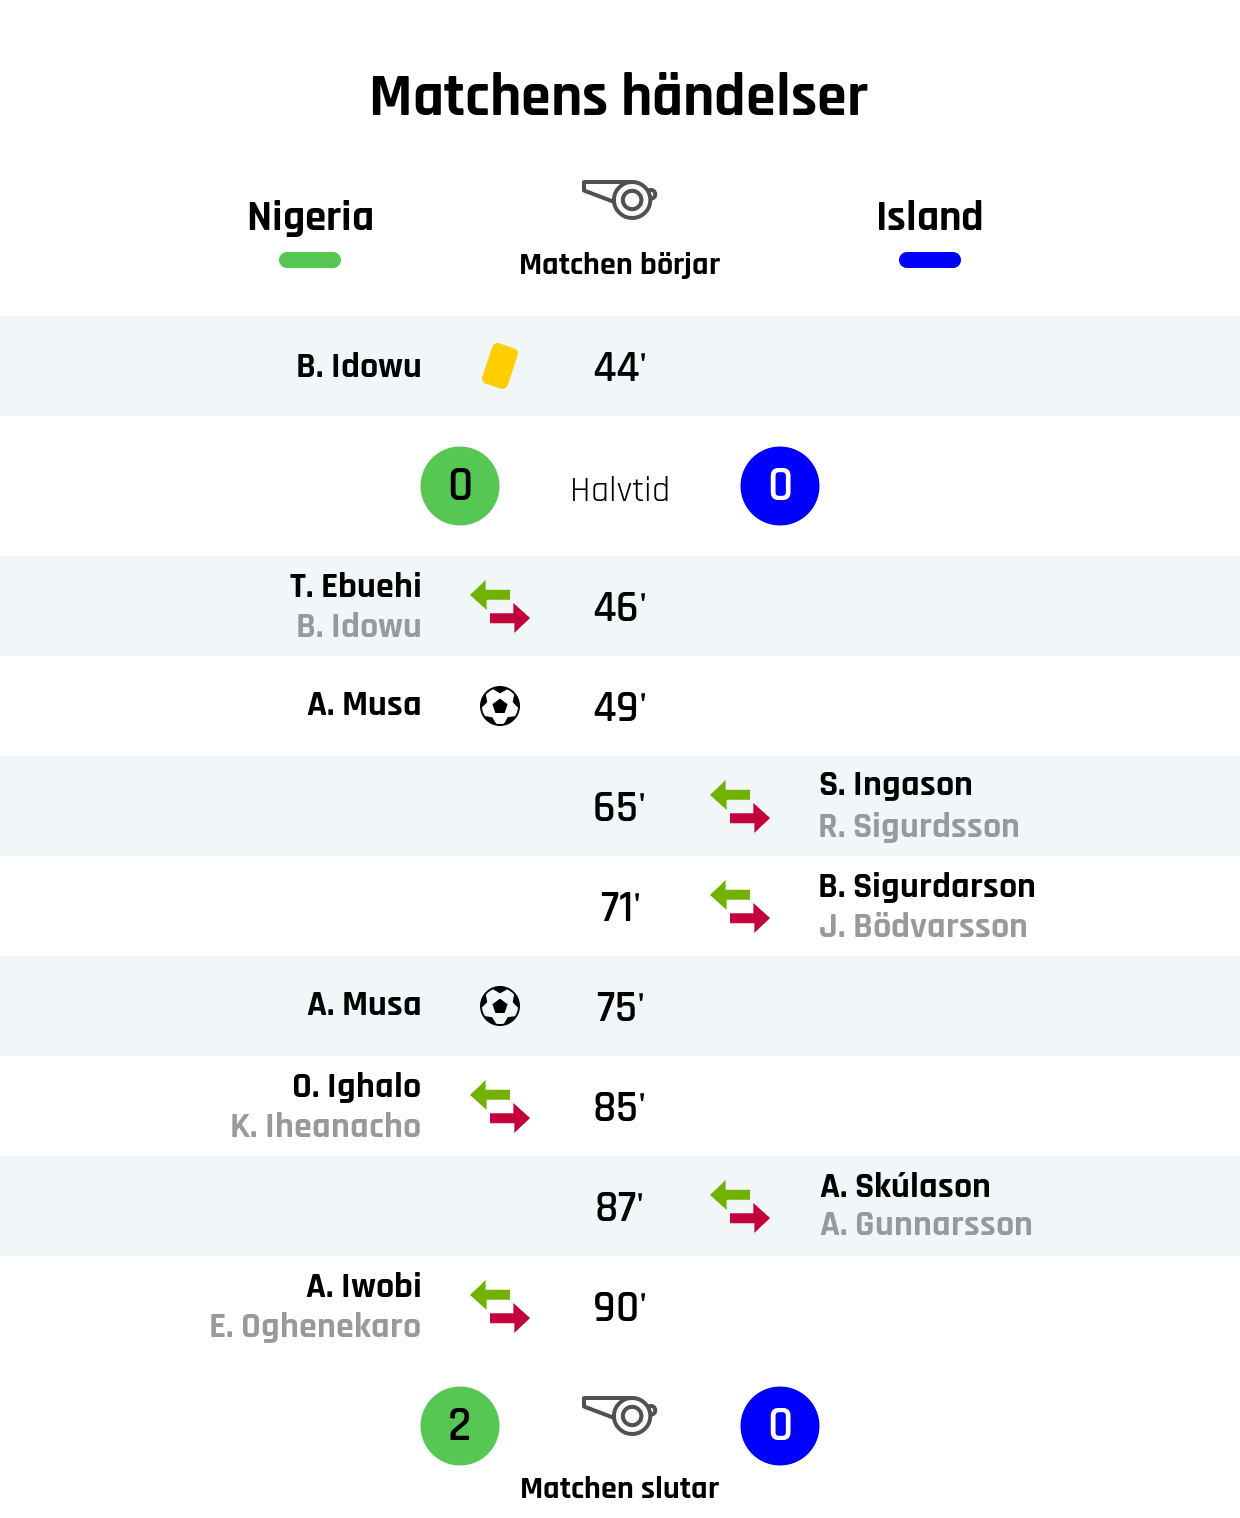 44' Gult kort: B. Idowu, Nigeria<br /> Resultat i halvtid: Nigeria 0, Island 0<br /> 46' Nigerias byte: T. Ebuehi in, B. Idowu ut<br /> 49' Mål Nigeria: A. Musa<br /> 65' Islands byte: S. Ingason in, R. Sigurdsson ut<br /> 71' Islands byte: B. Sigurdarson in, J. Bödvarsson ut<br /> 75' Mål Nigeria: A. Musa<br /> 85' Nigerias byte: O. Ighalo in, K. Iheanacho ut<br /> 87' Islands byte: A. Skúlason in, A. Gunnarsson ut<br /> 90' Nigerias byte: A. Iwobi in, E. Oghenekaro ut<br /> Slutresultat: Nigeria 2, Island 0